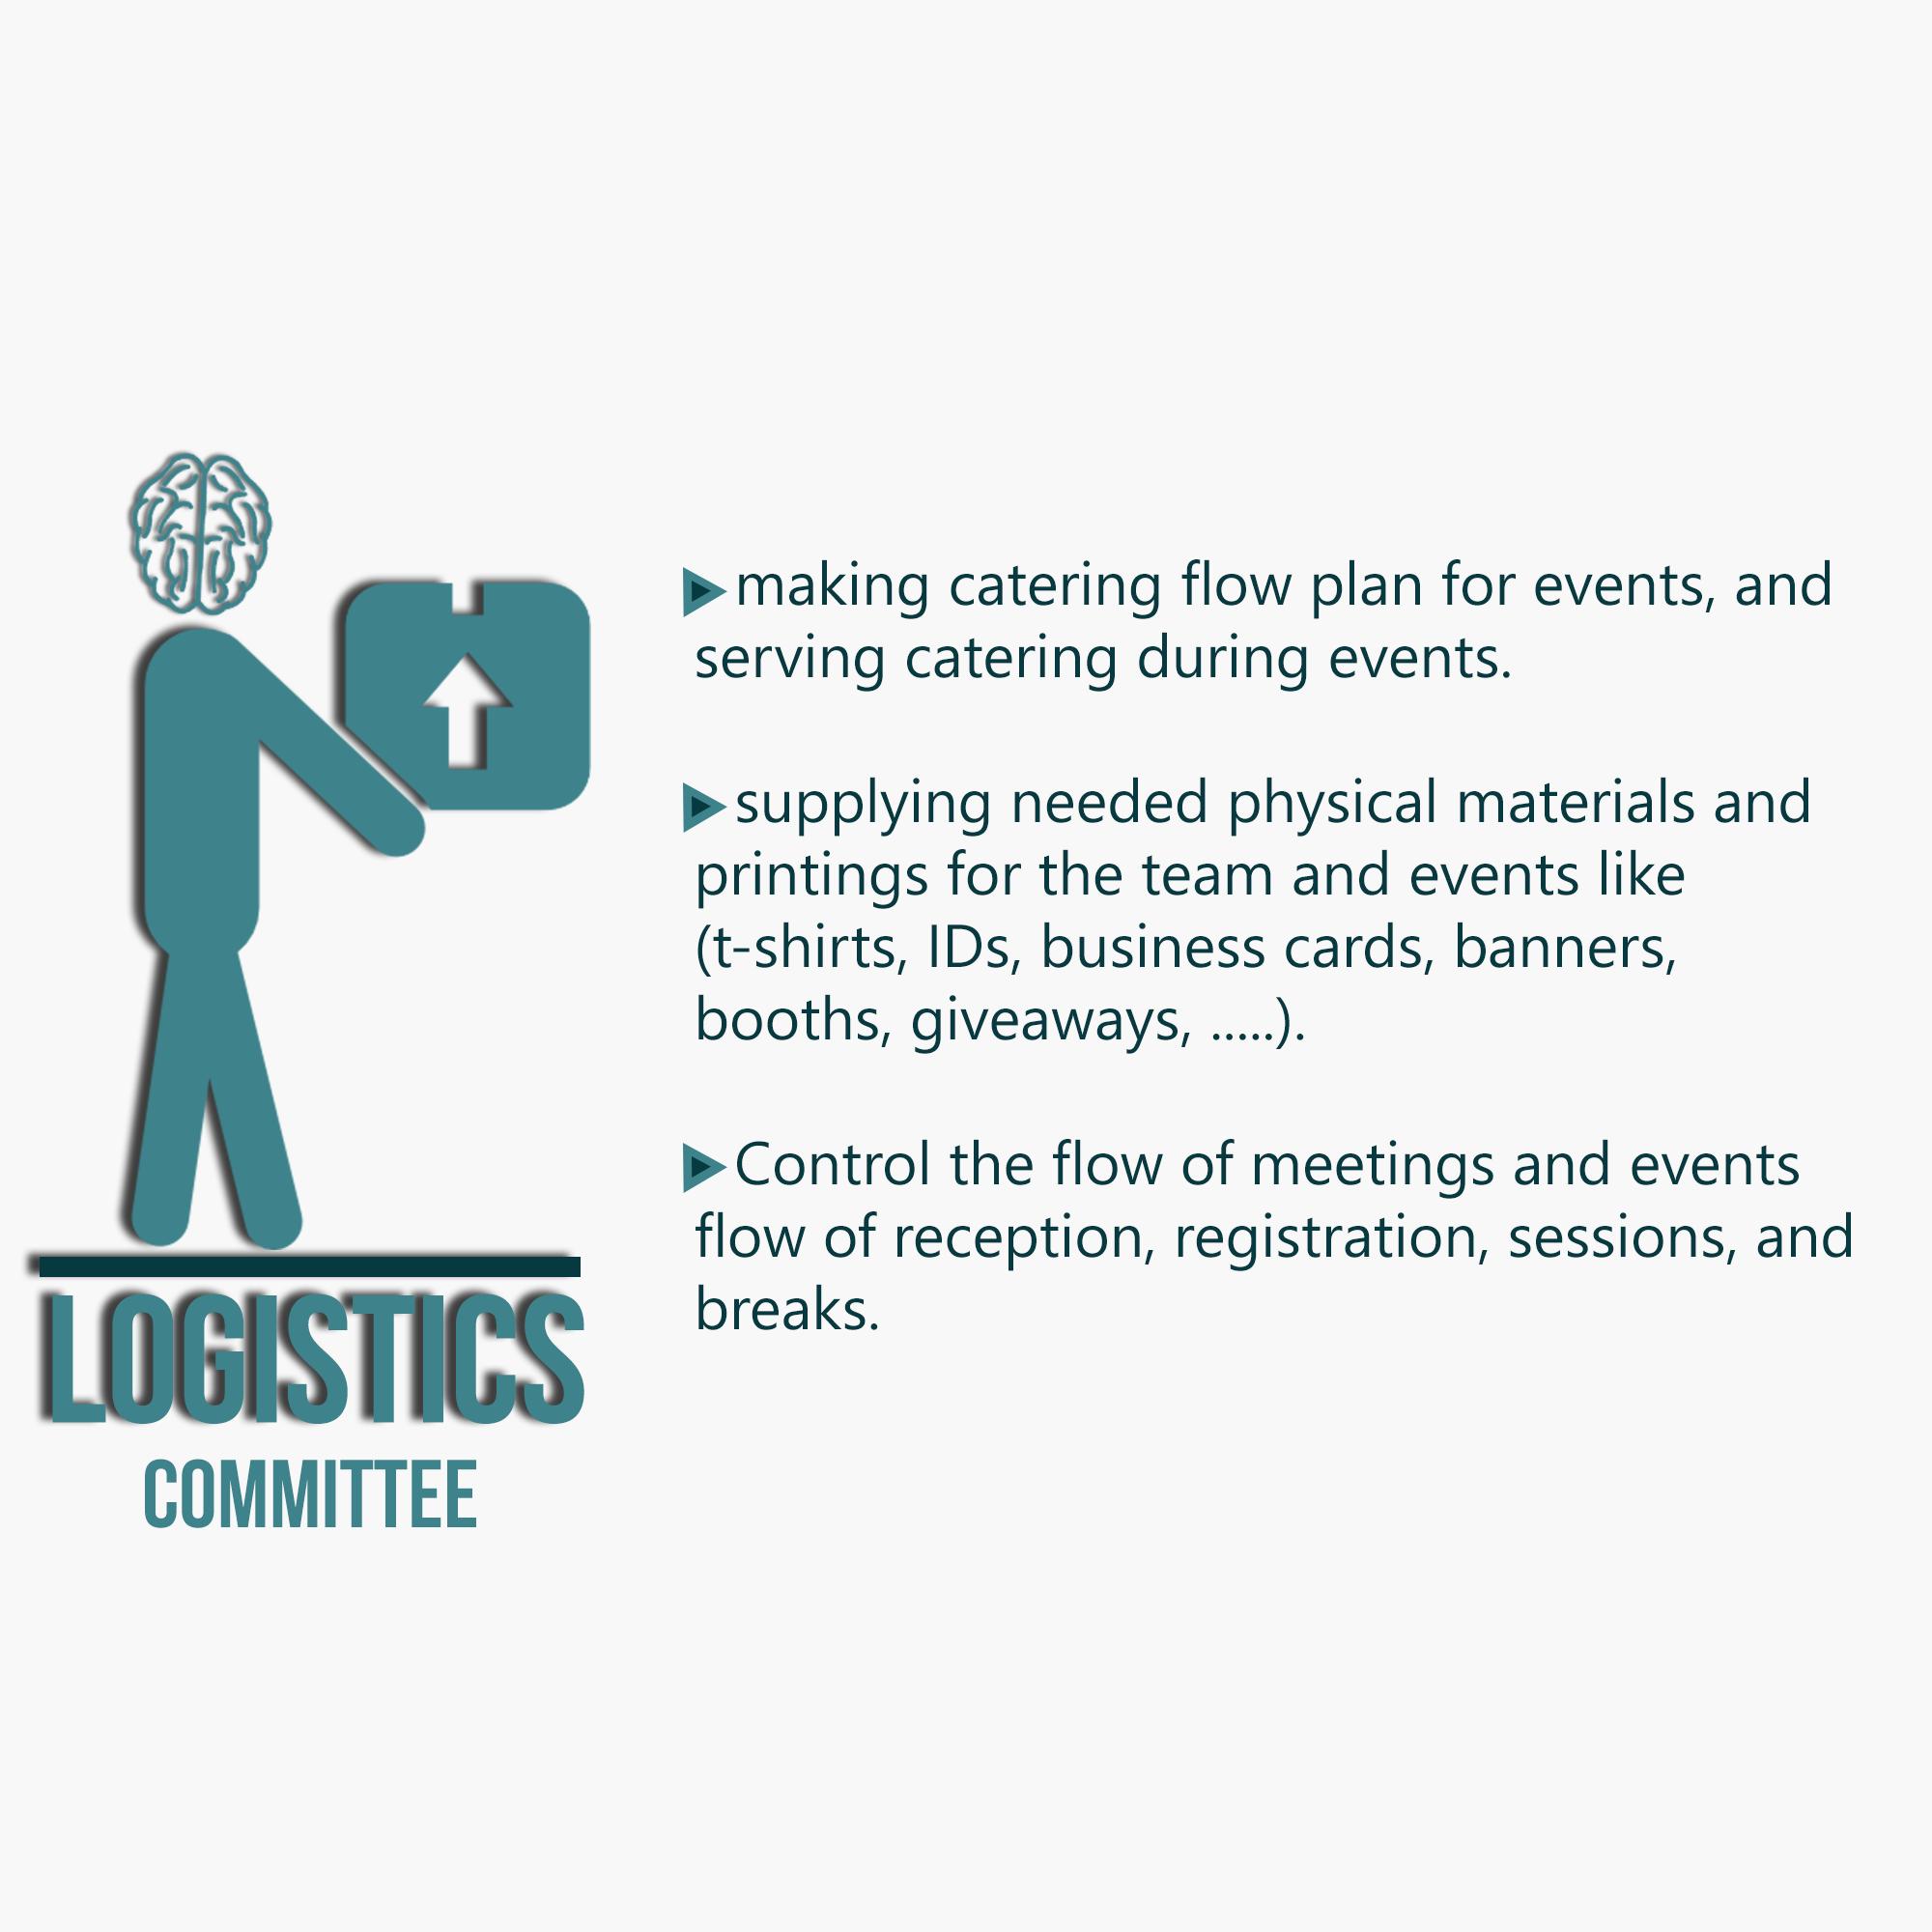 Logistics Committee Description  Committees Description